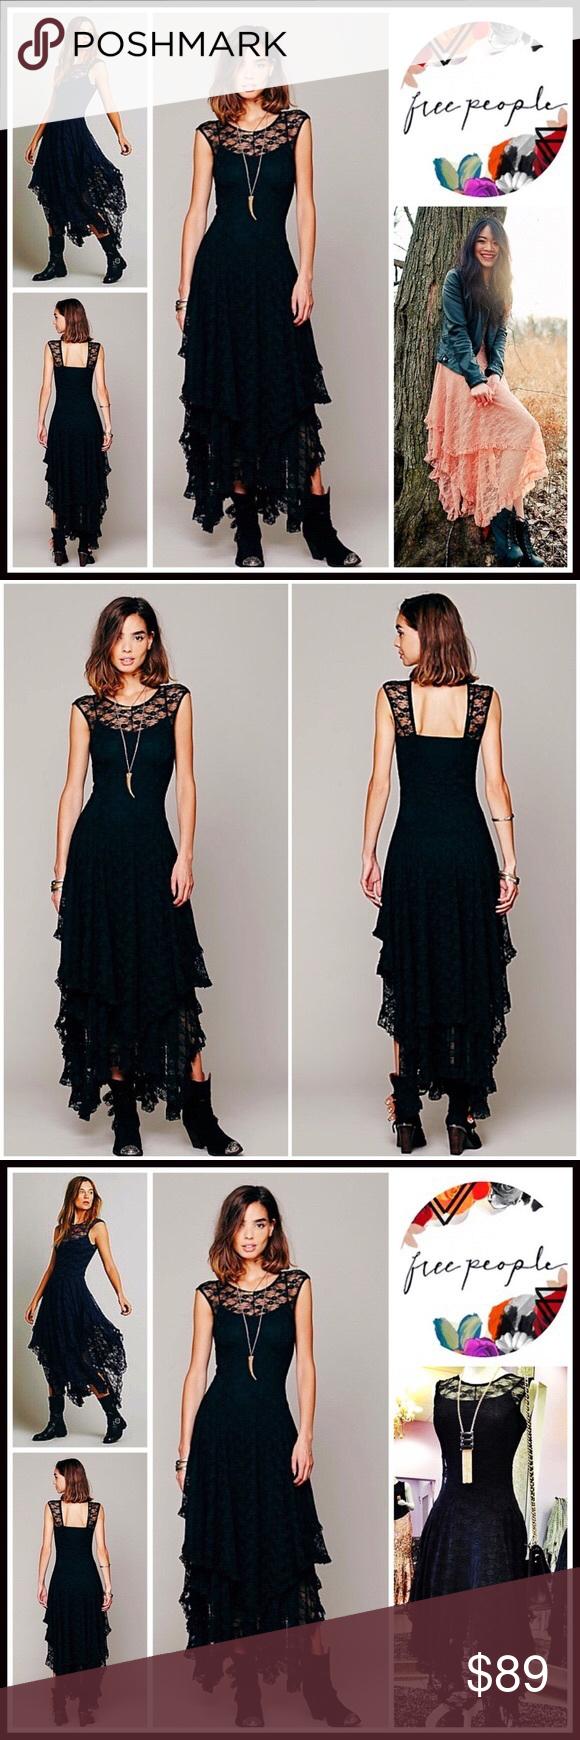 Black embellished neck semi-sheer maxi dress